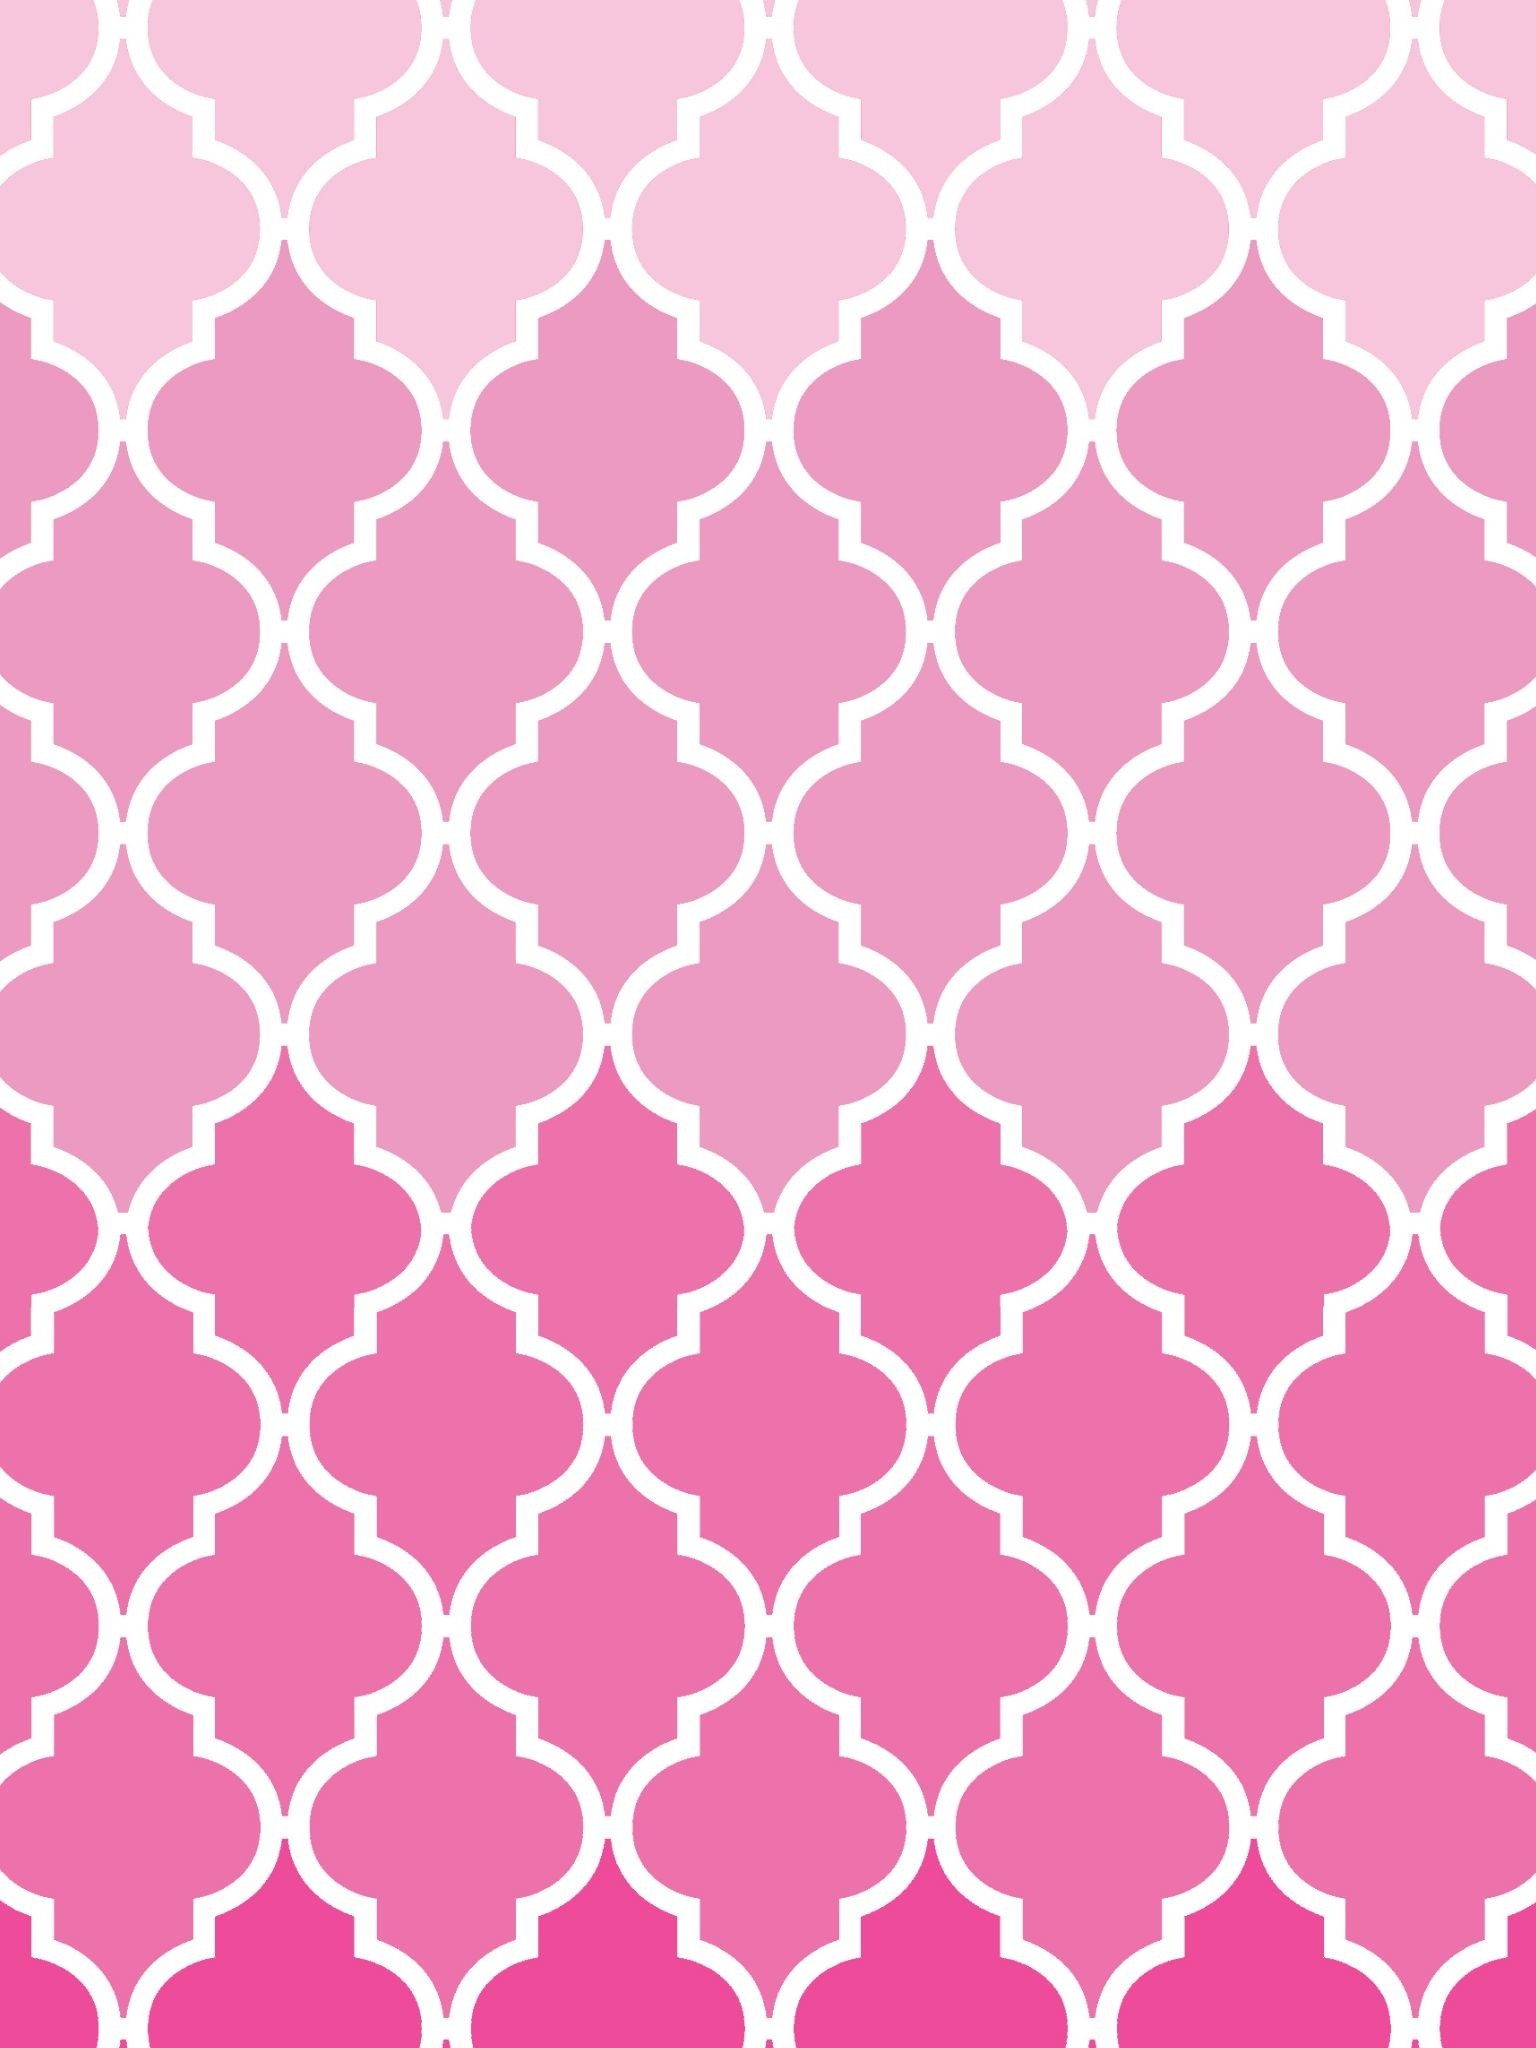 Ombre Latticework iPad Air 2 Wallpaper – Pink White